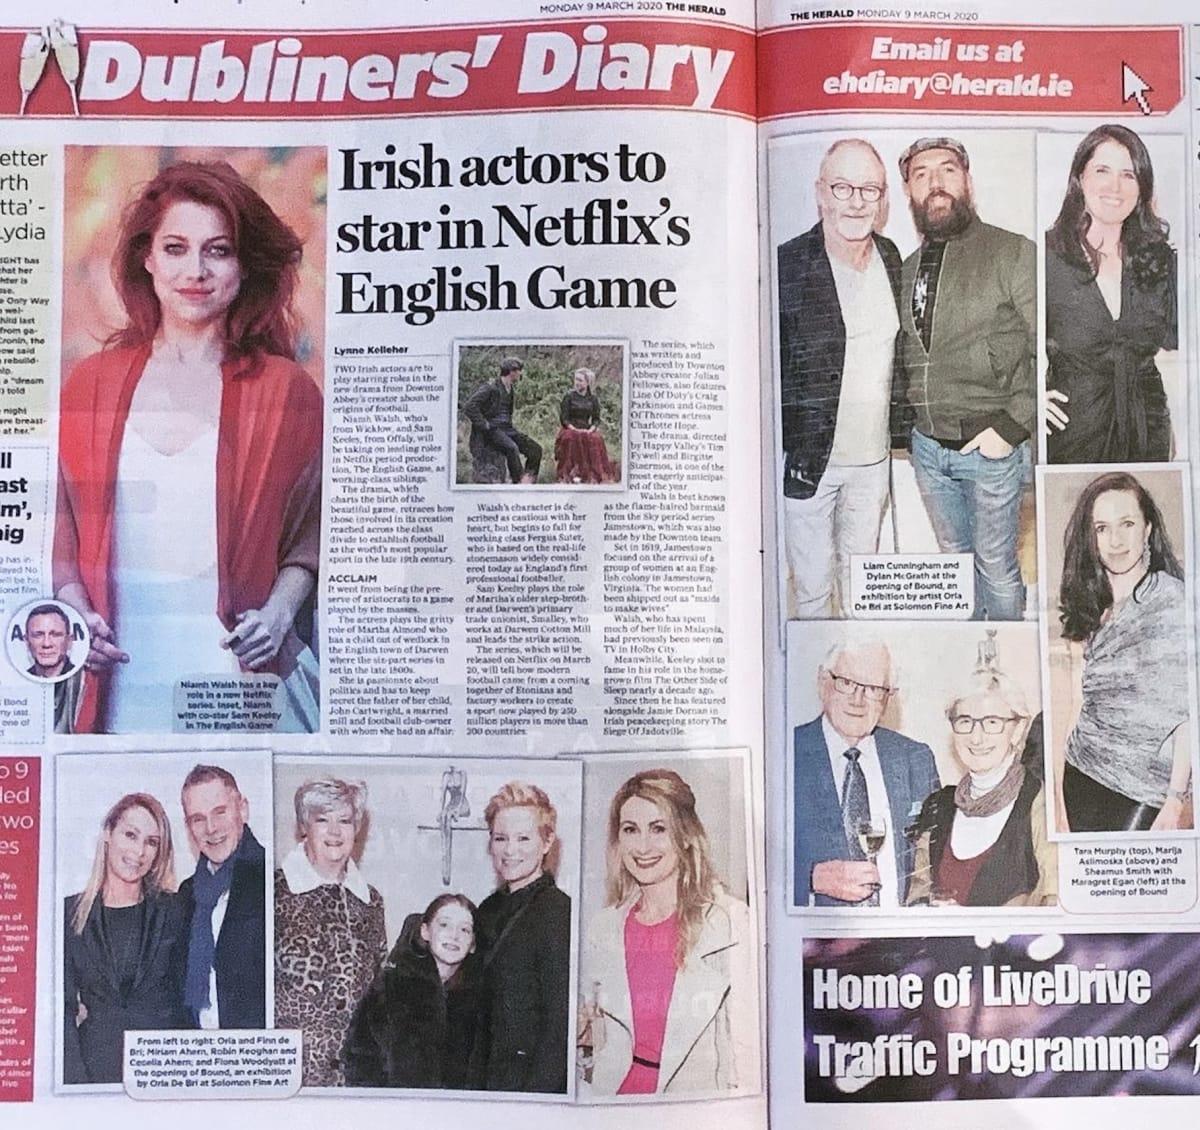 Evening Herald: Dubliner's Diary